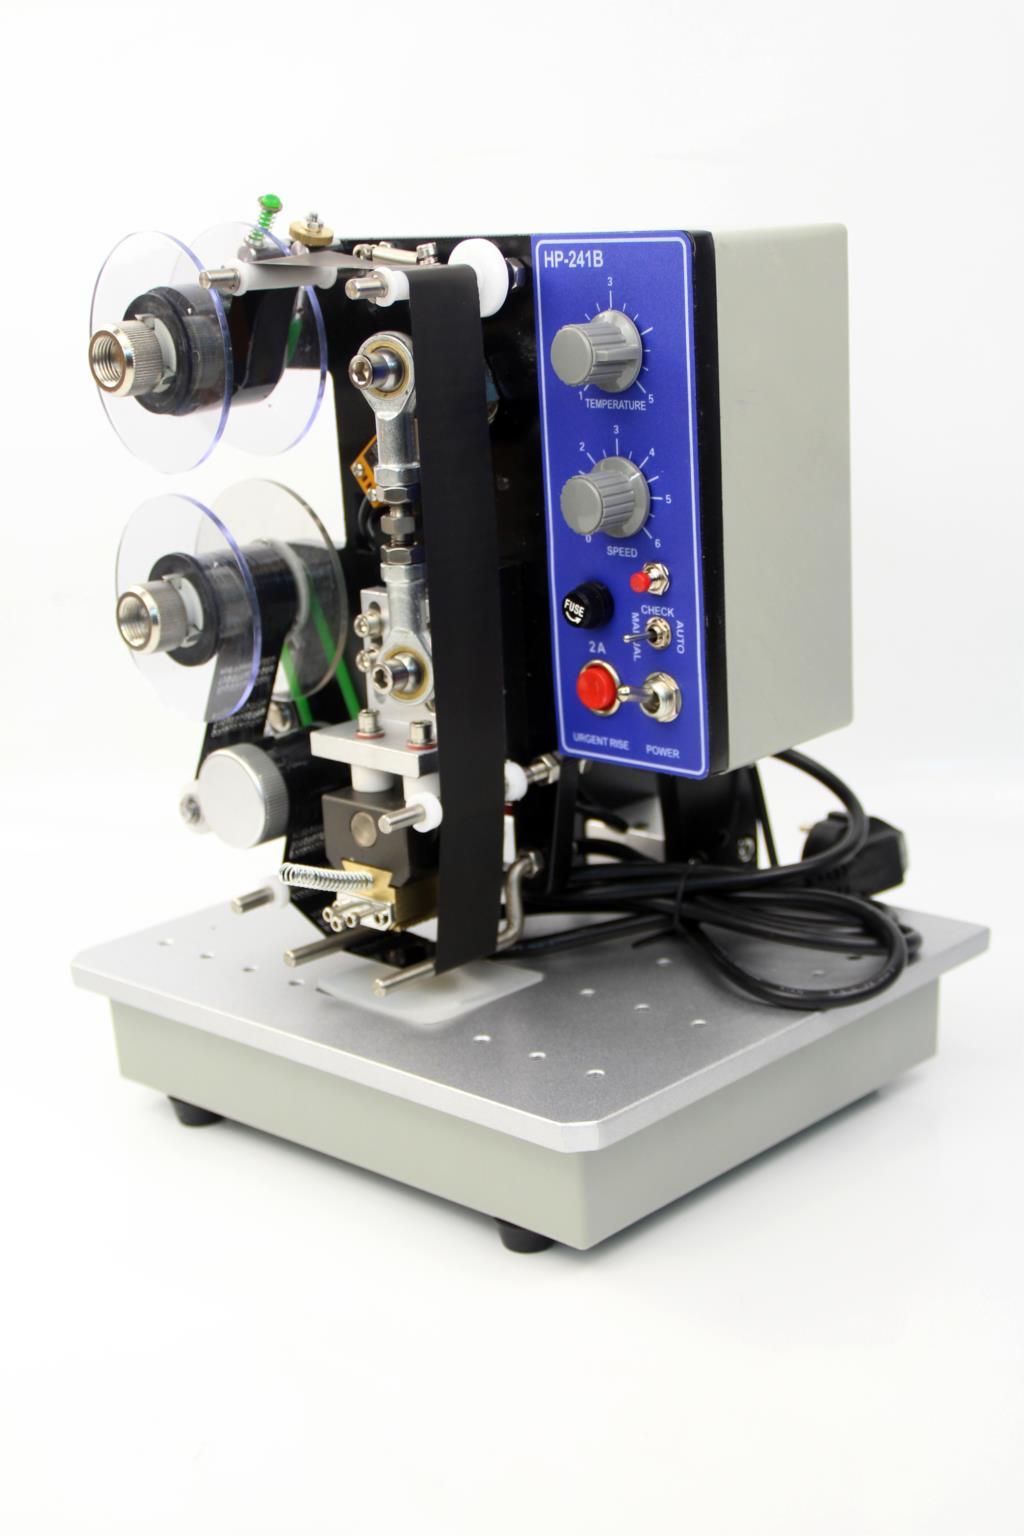 HP-241B الكهربائية الشريط ماكينة ترميز ماكينة ترميز الدفعات ماكينة ترميز آلة طباعة